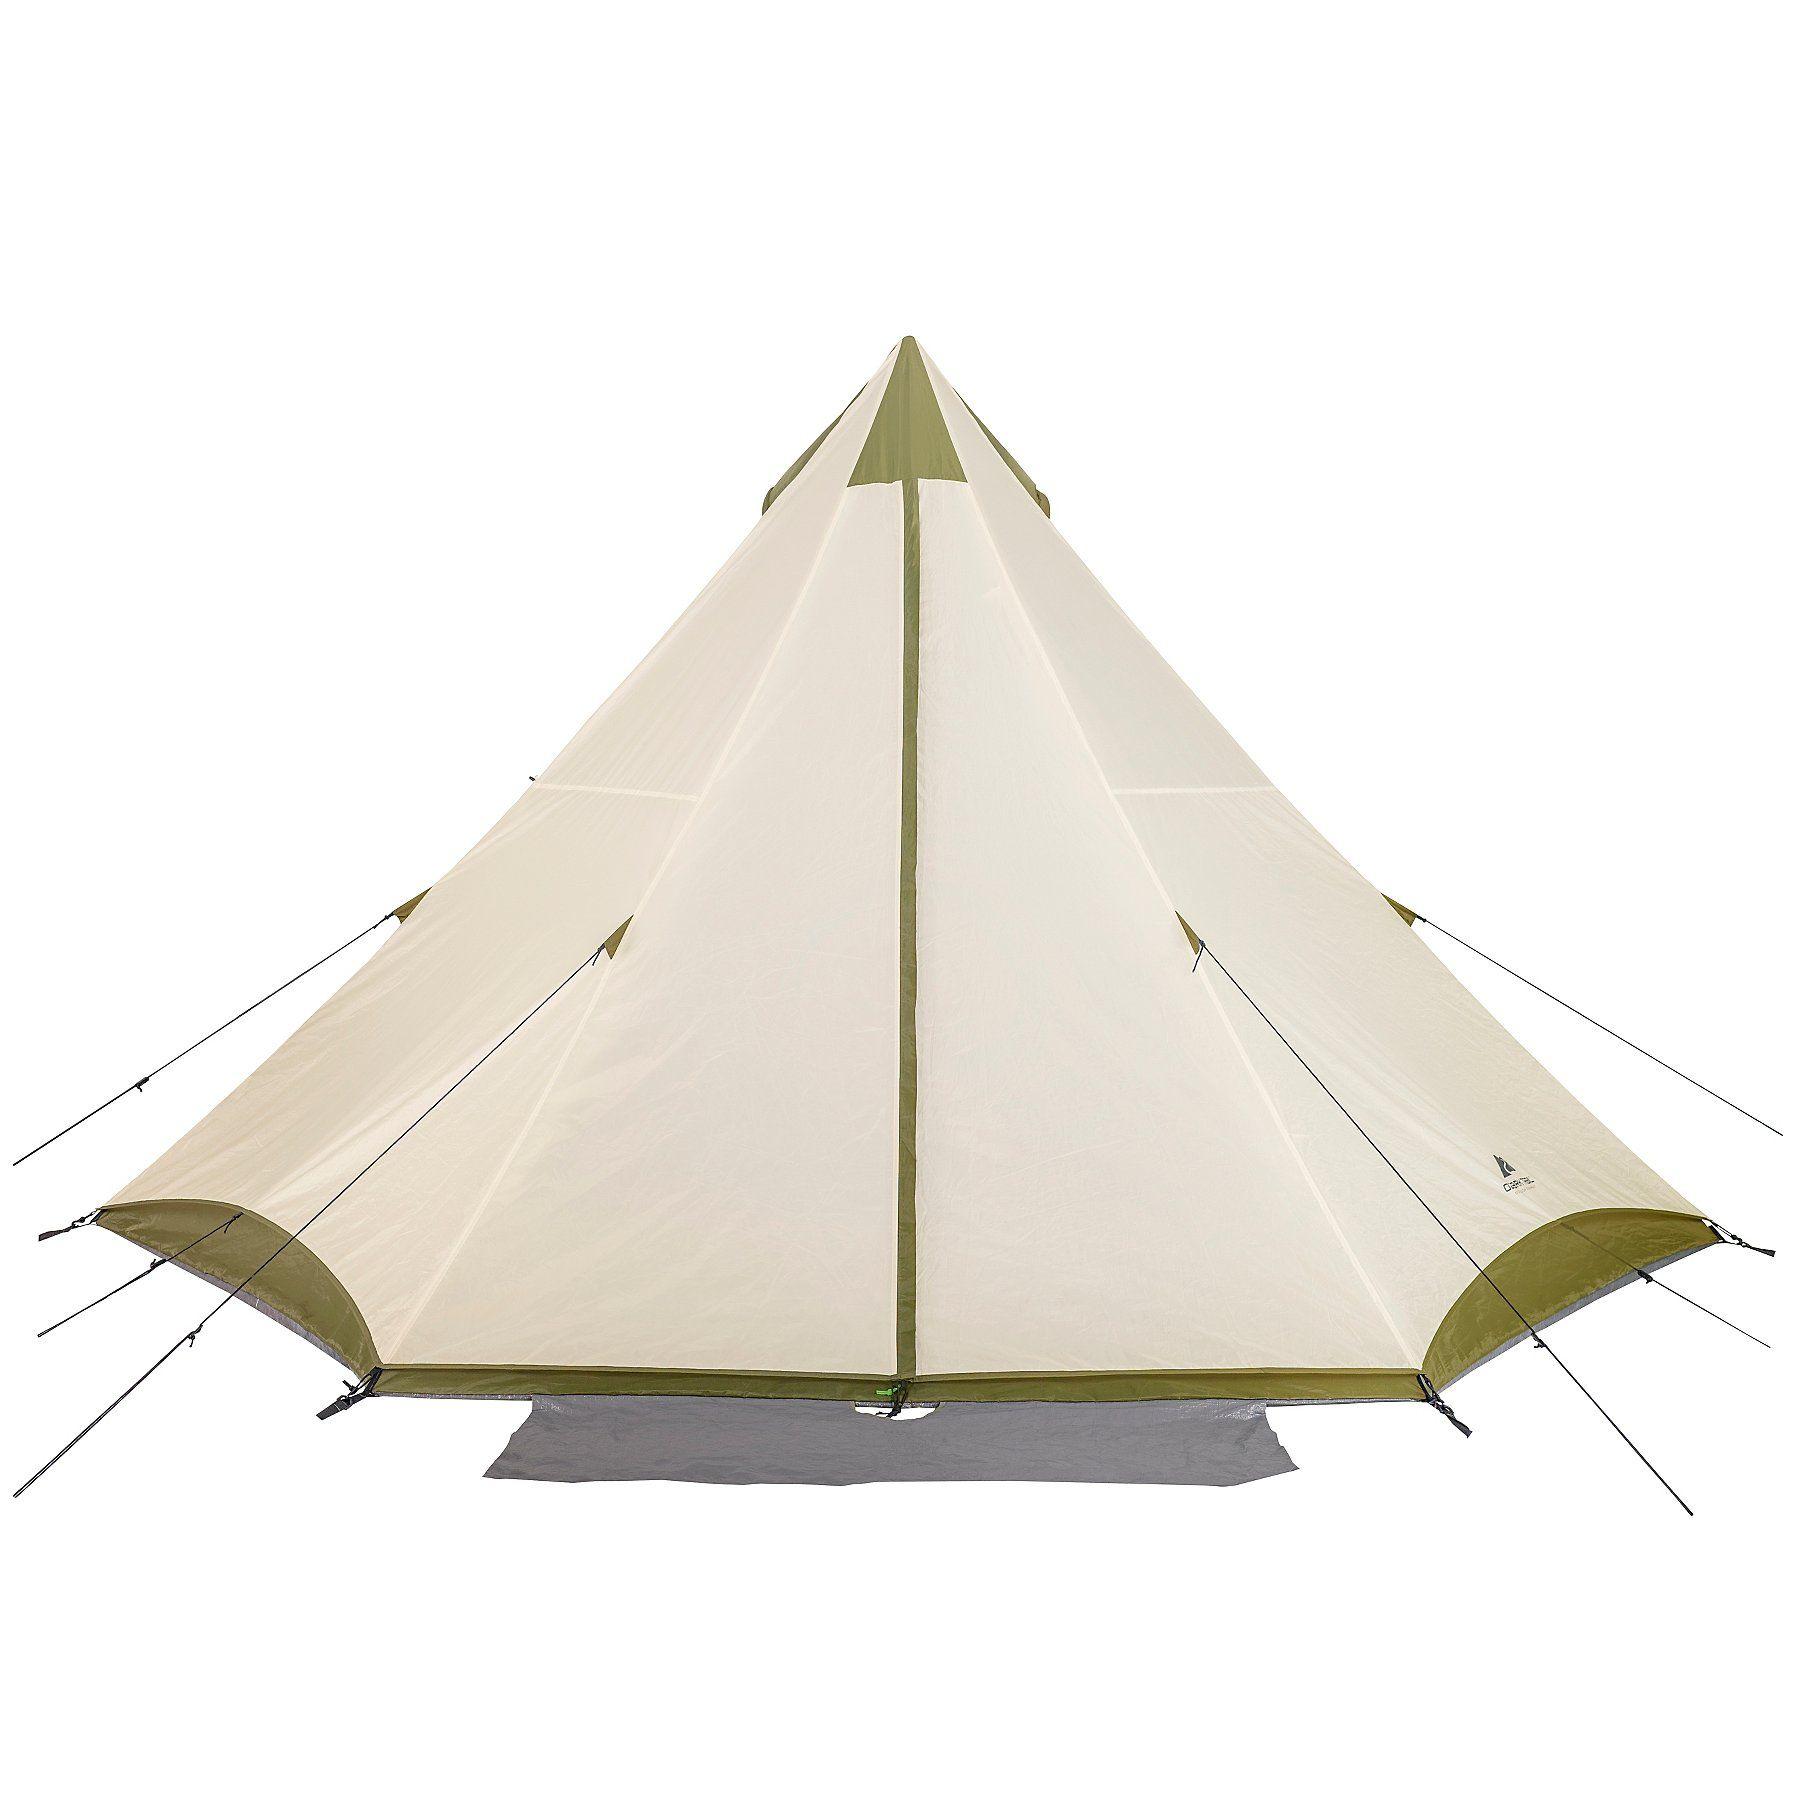 Ozark Trail Khaki 8 Person Teepee Tent Home Garden George Teepee Tent Tent Ozark Trail